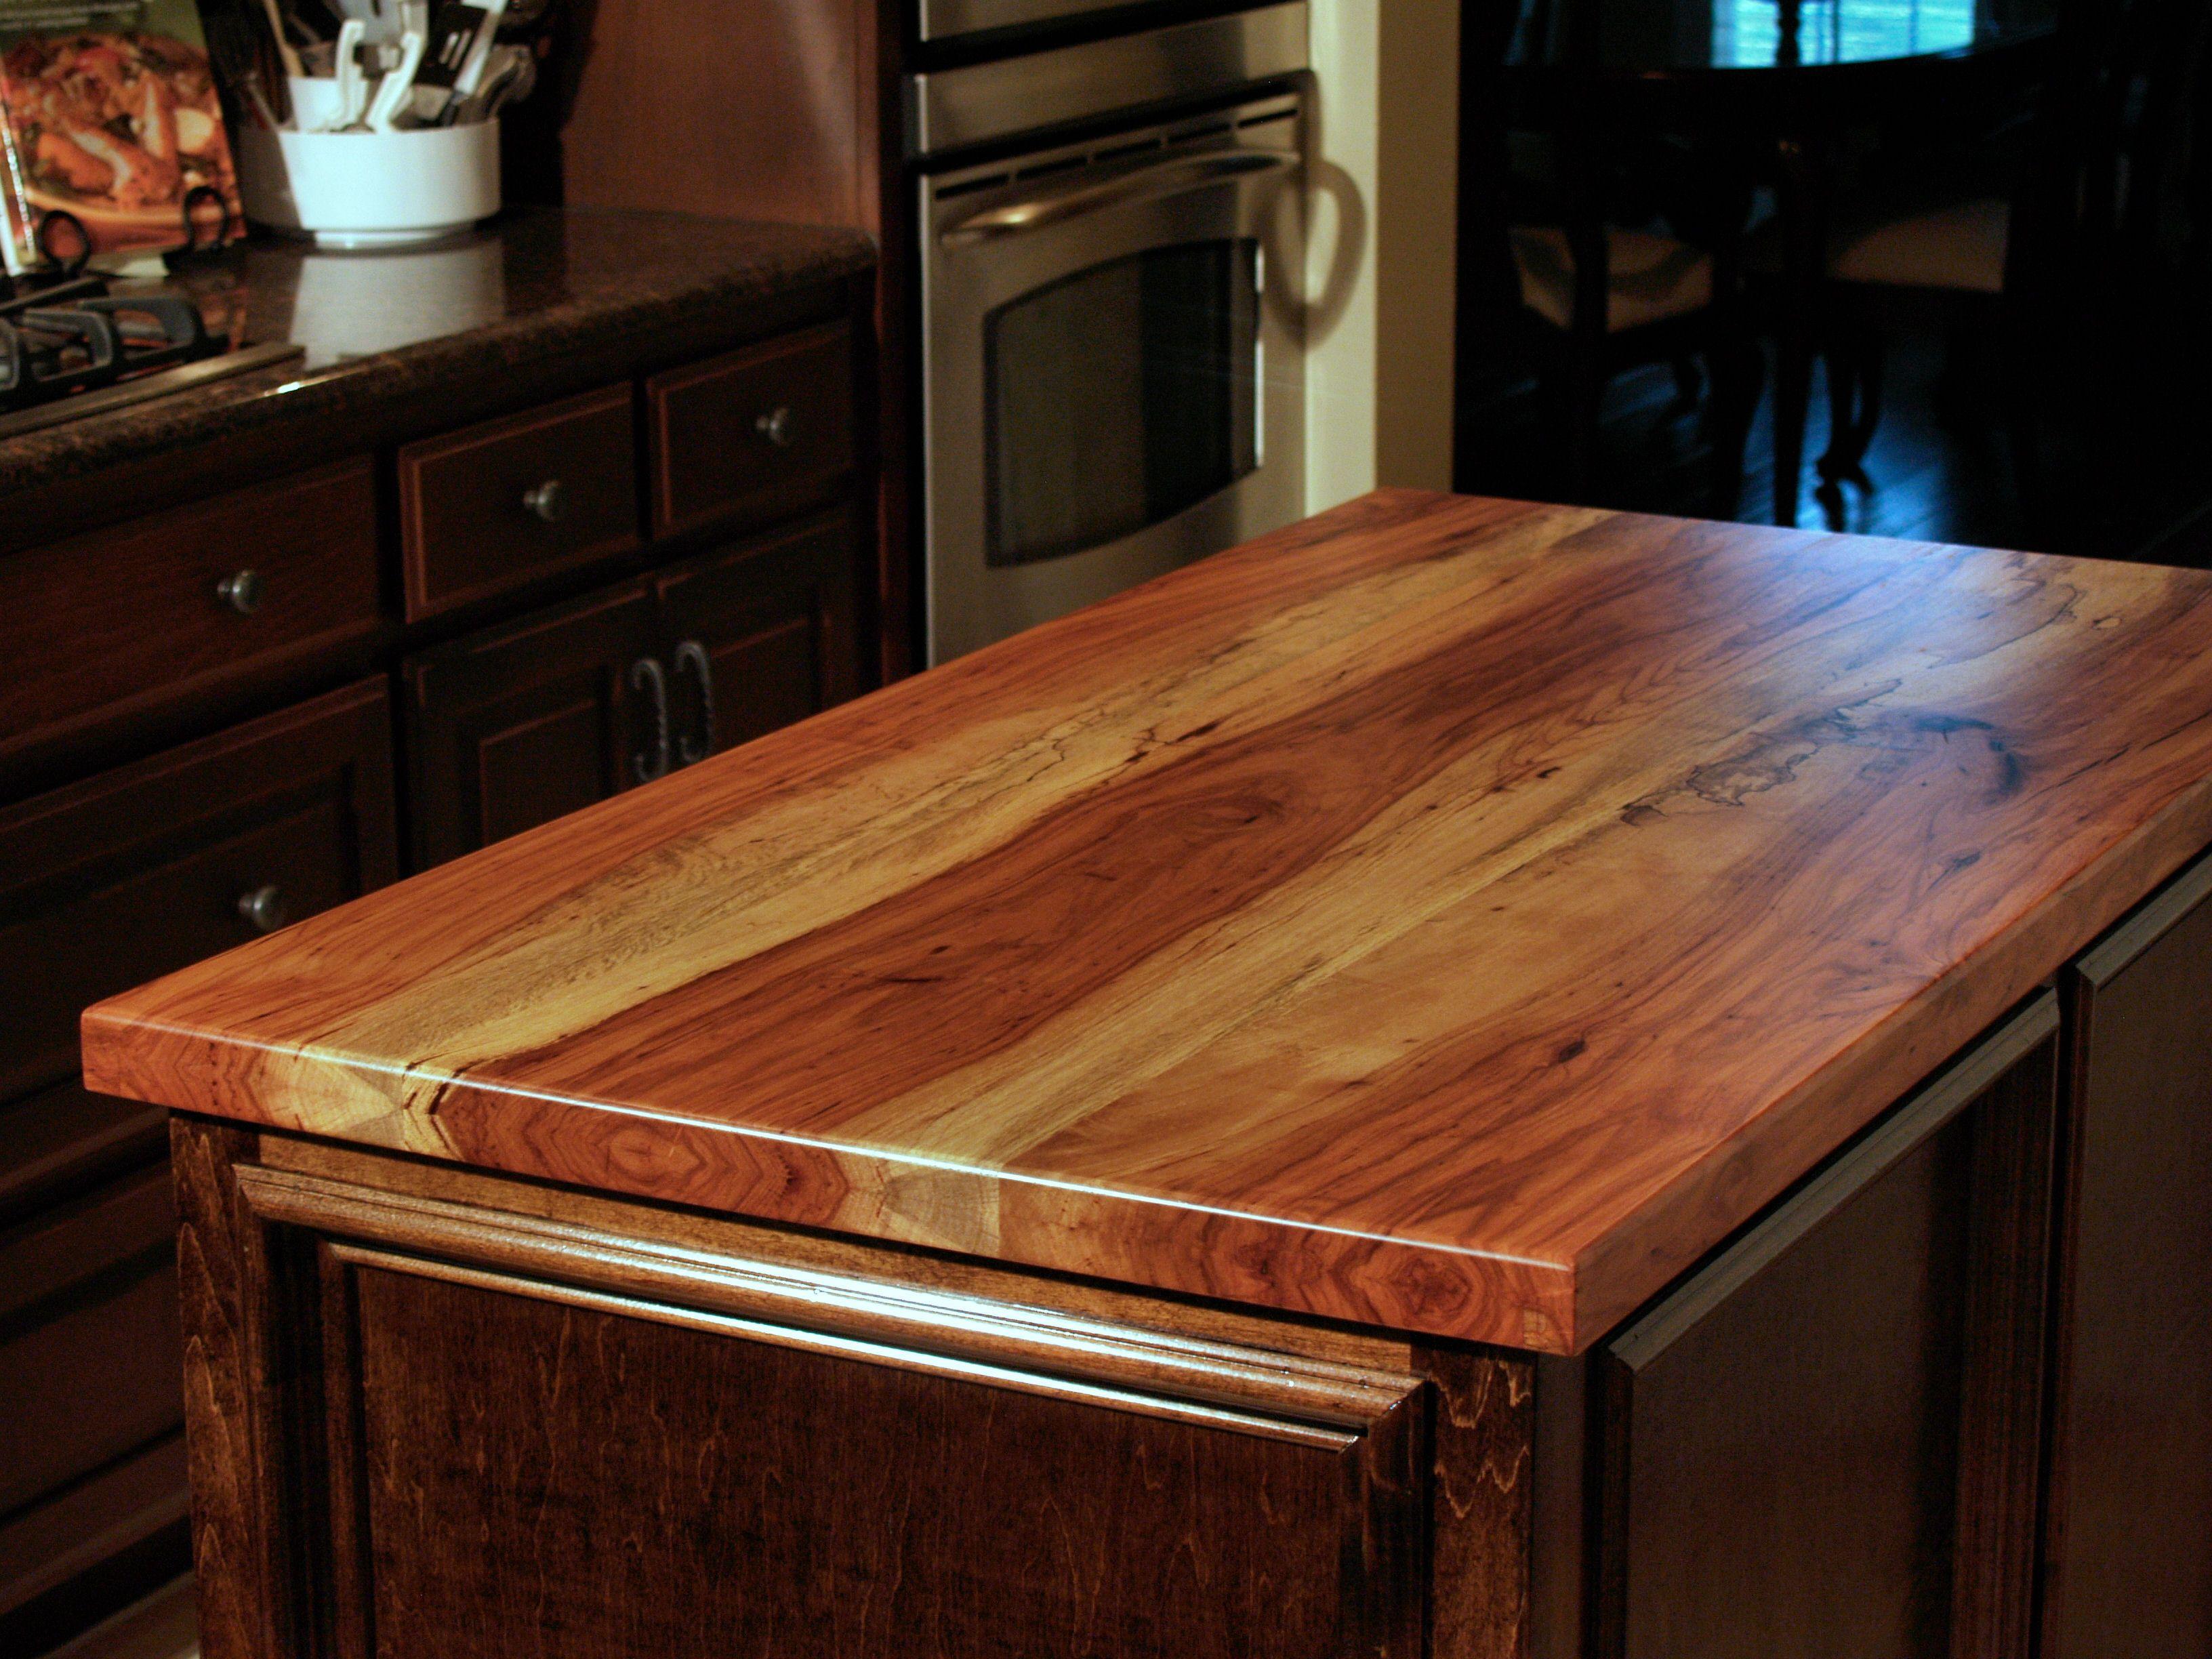 spalted pecan wood countertop photo gallery by devos custom woodworking. Black Bedroom Furniture Sets. Home Design Ideas